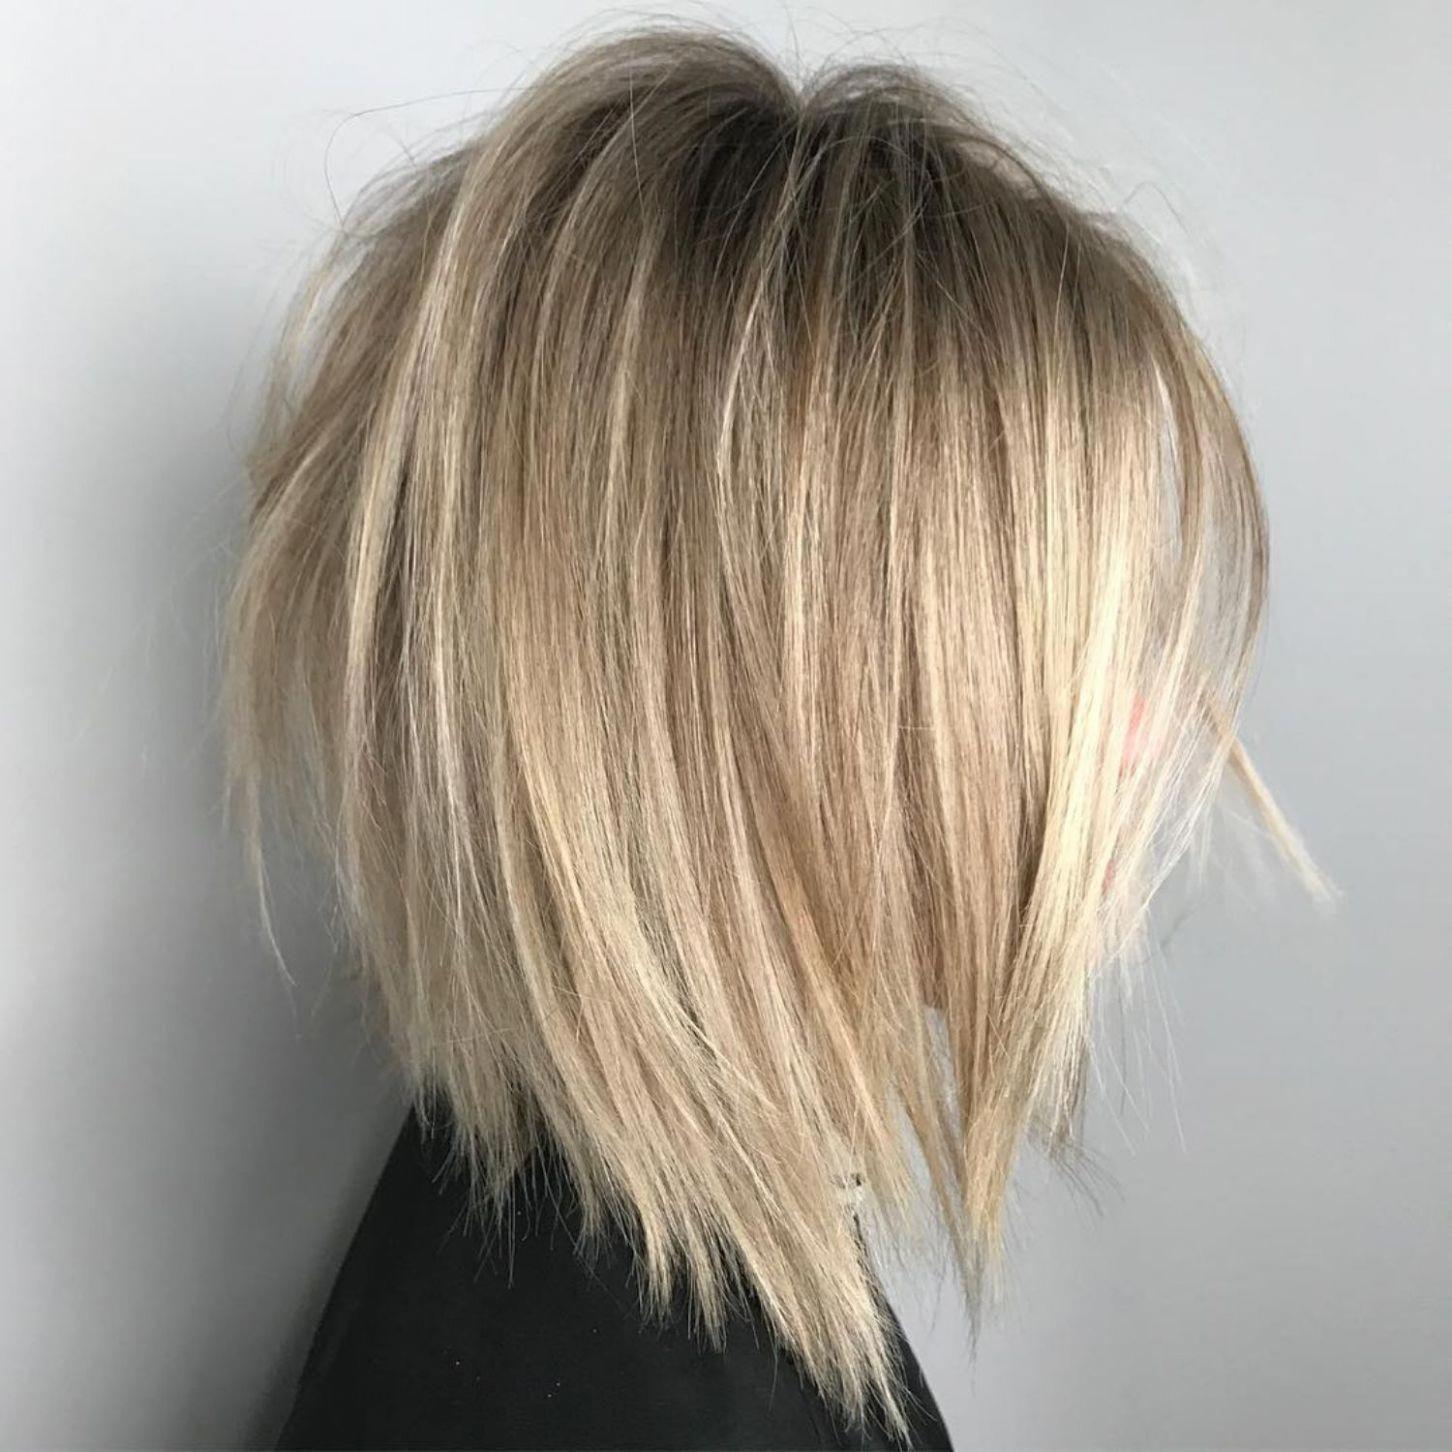 Bob Haircuts For Thick Straight Hair